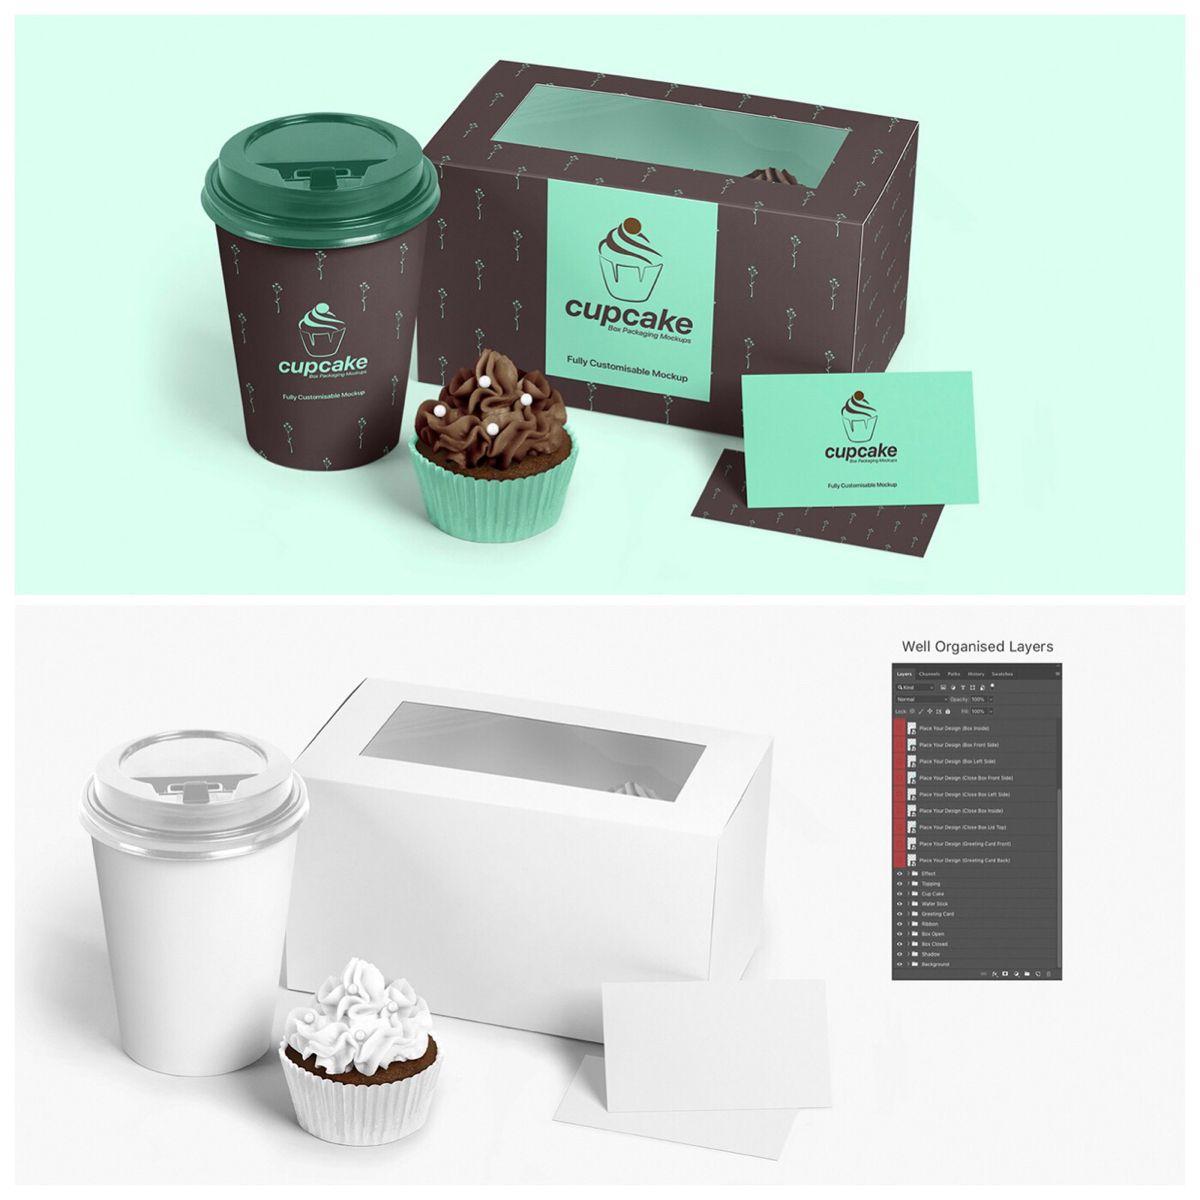 Download Cupcake Box Mockup Cupcake Packaging Mockup Pixpiine In 2020 Cupcake Packaging Packaging Mockup Box Packaging